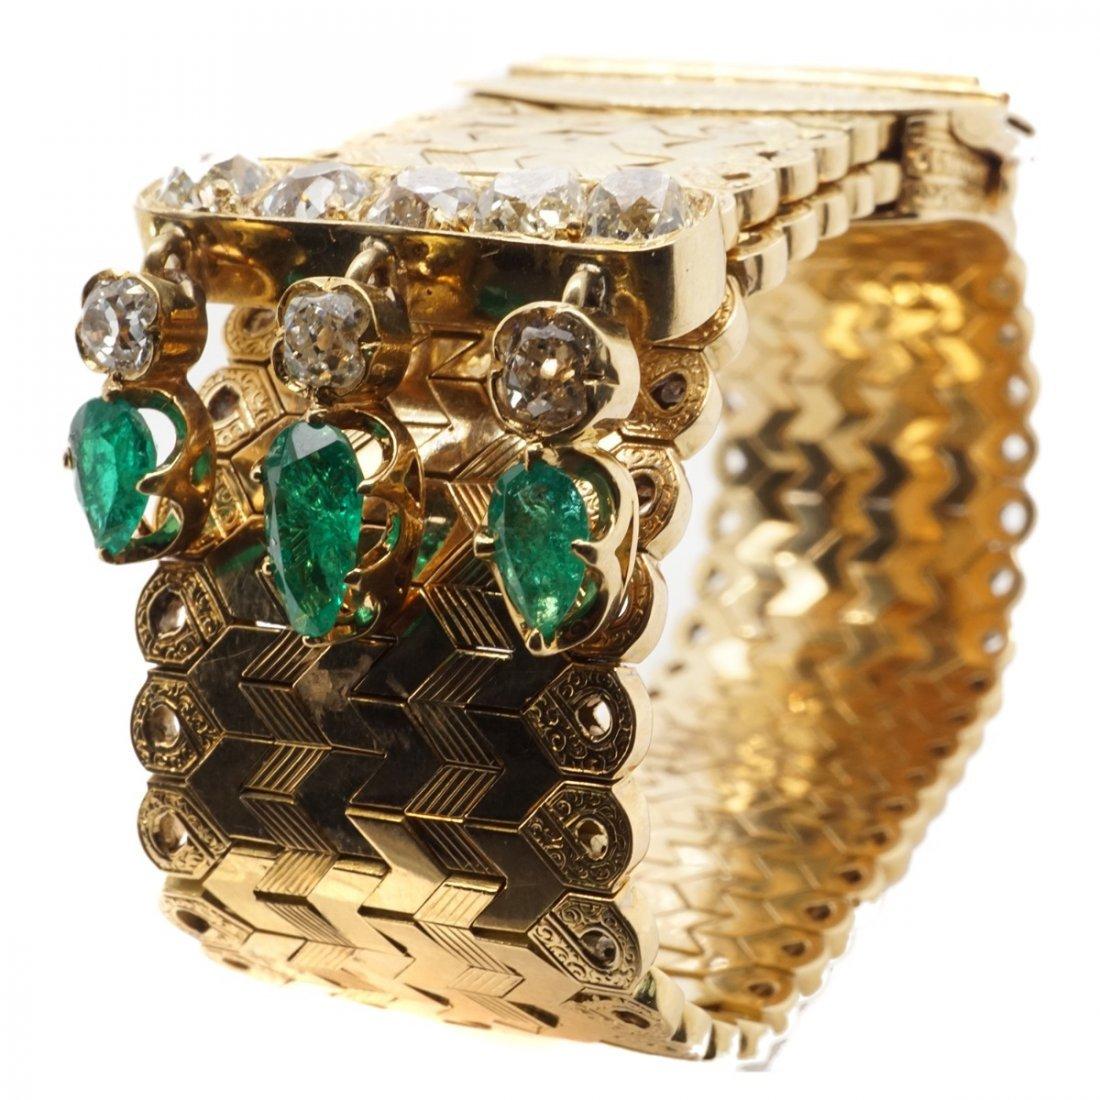 FRENCH EMERALD DIAMOND 18 KARAT GOLD BRACELET - 9